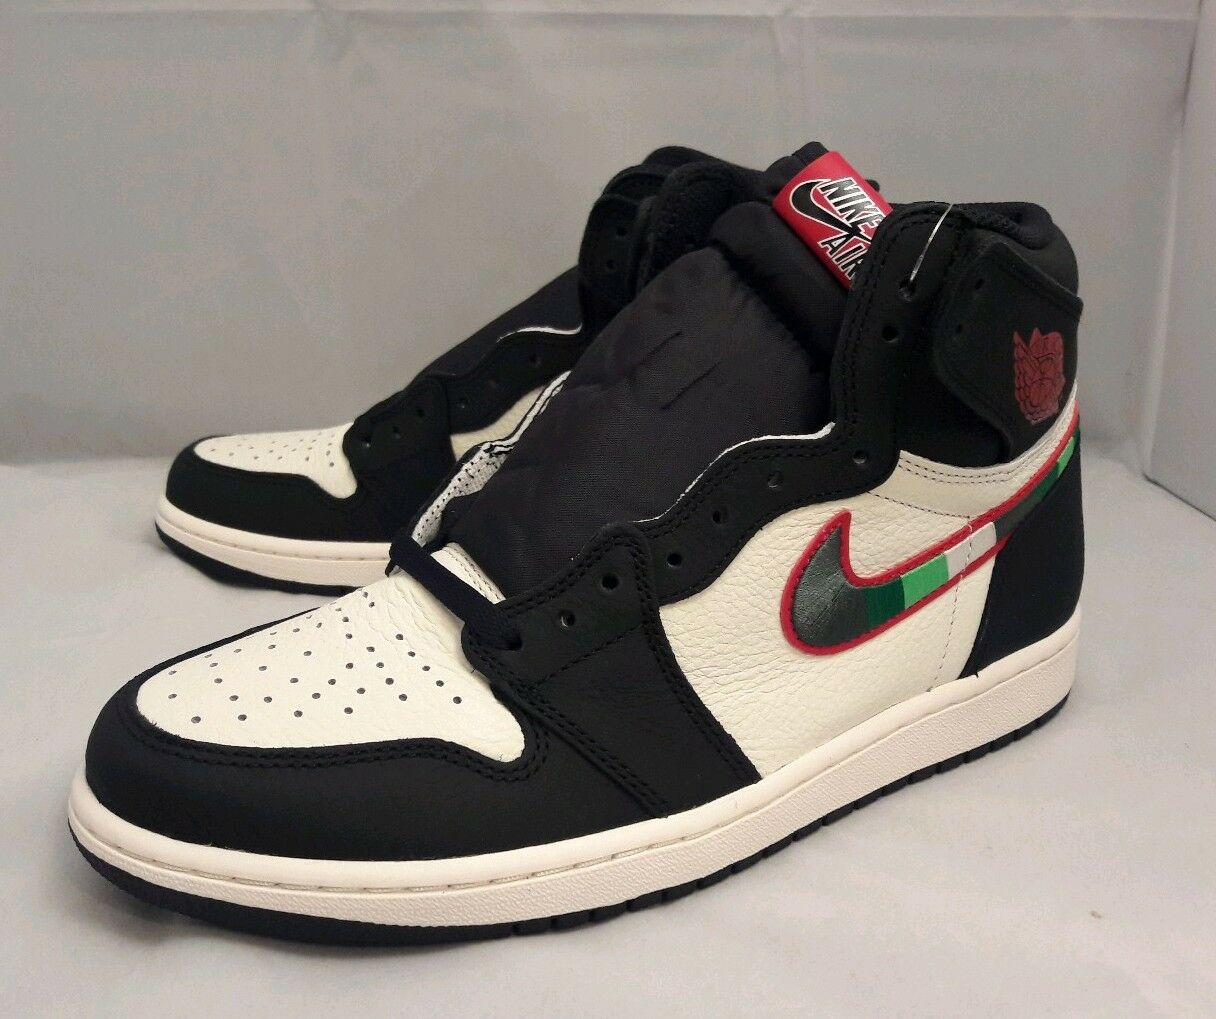 new concept 12afa 82e54 Nike Air Jordan Jordan Jordan 1 Retro High OG Sports Illustrated A Star is  Born 555088